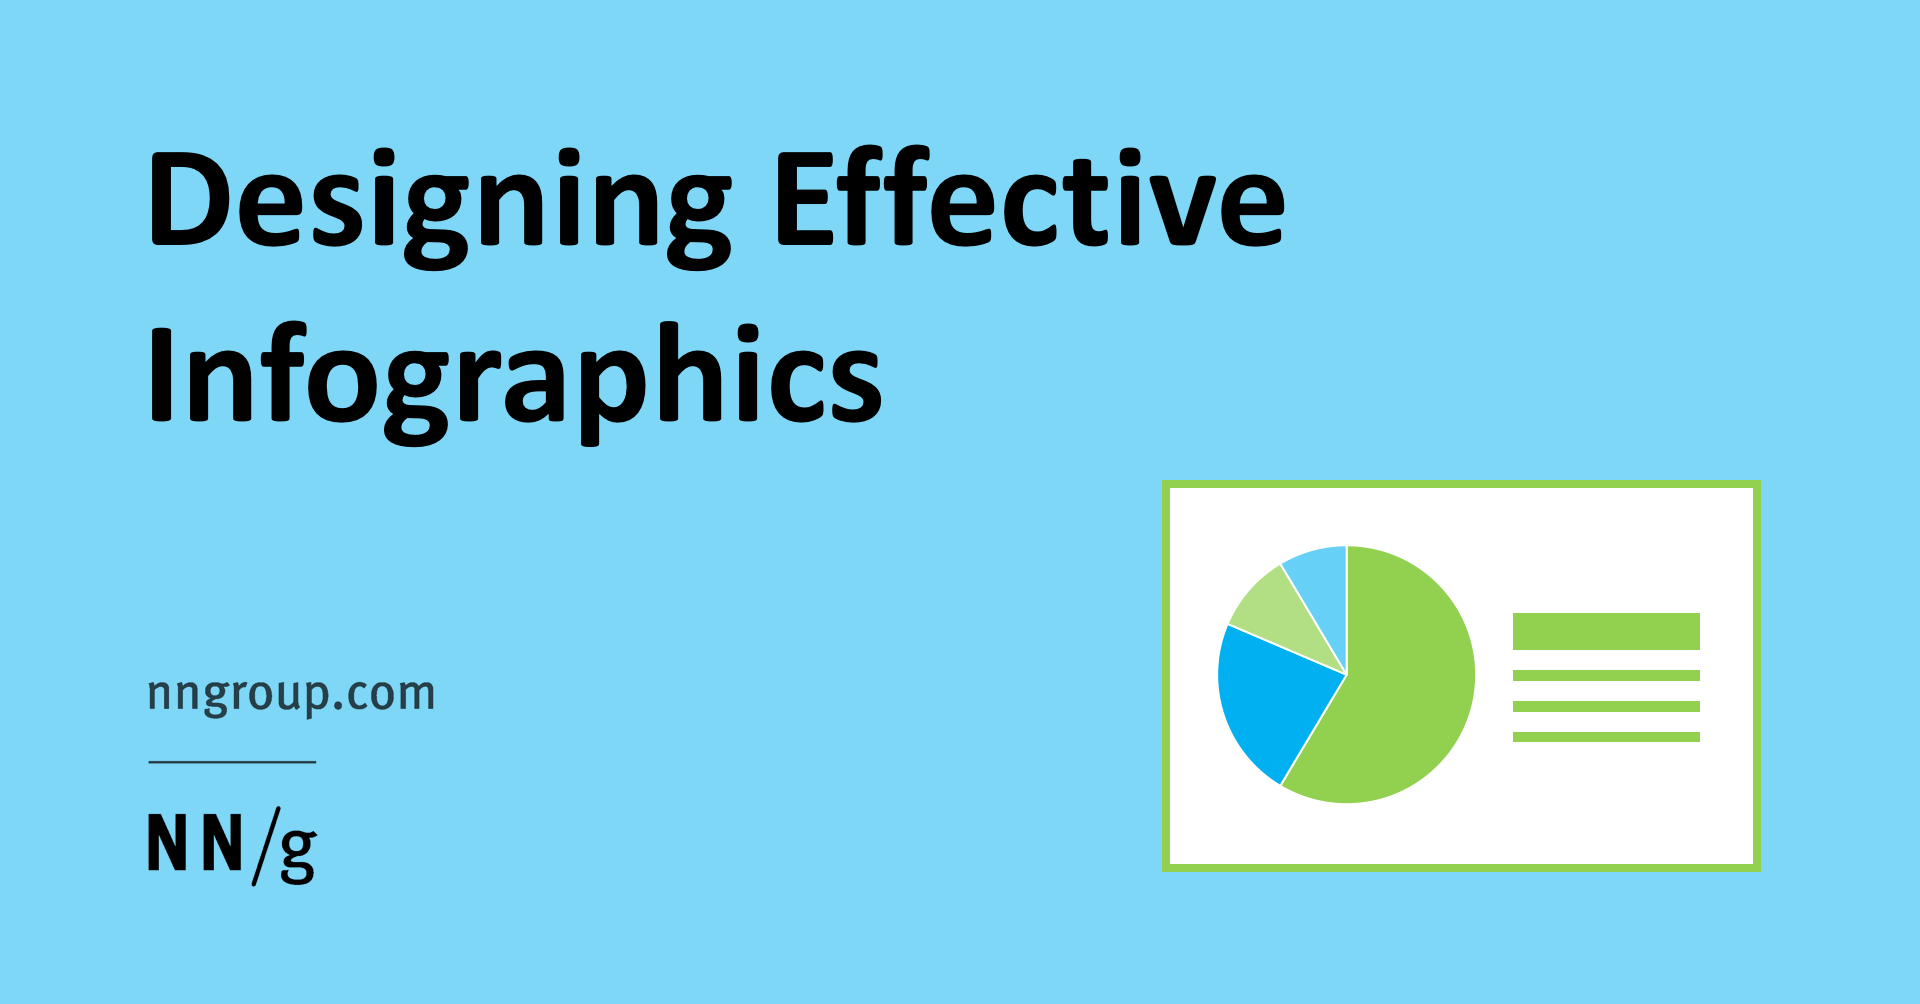 Designing Effective Infographics